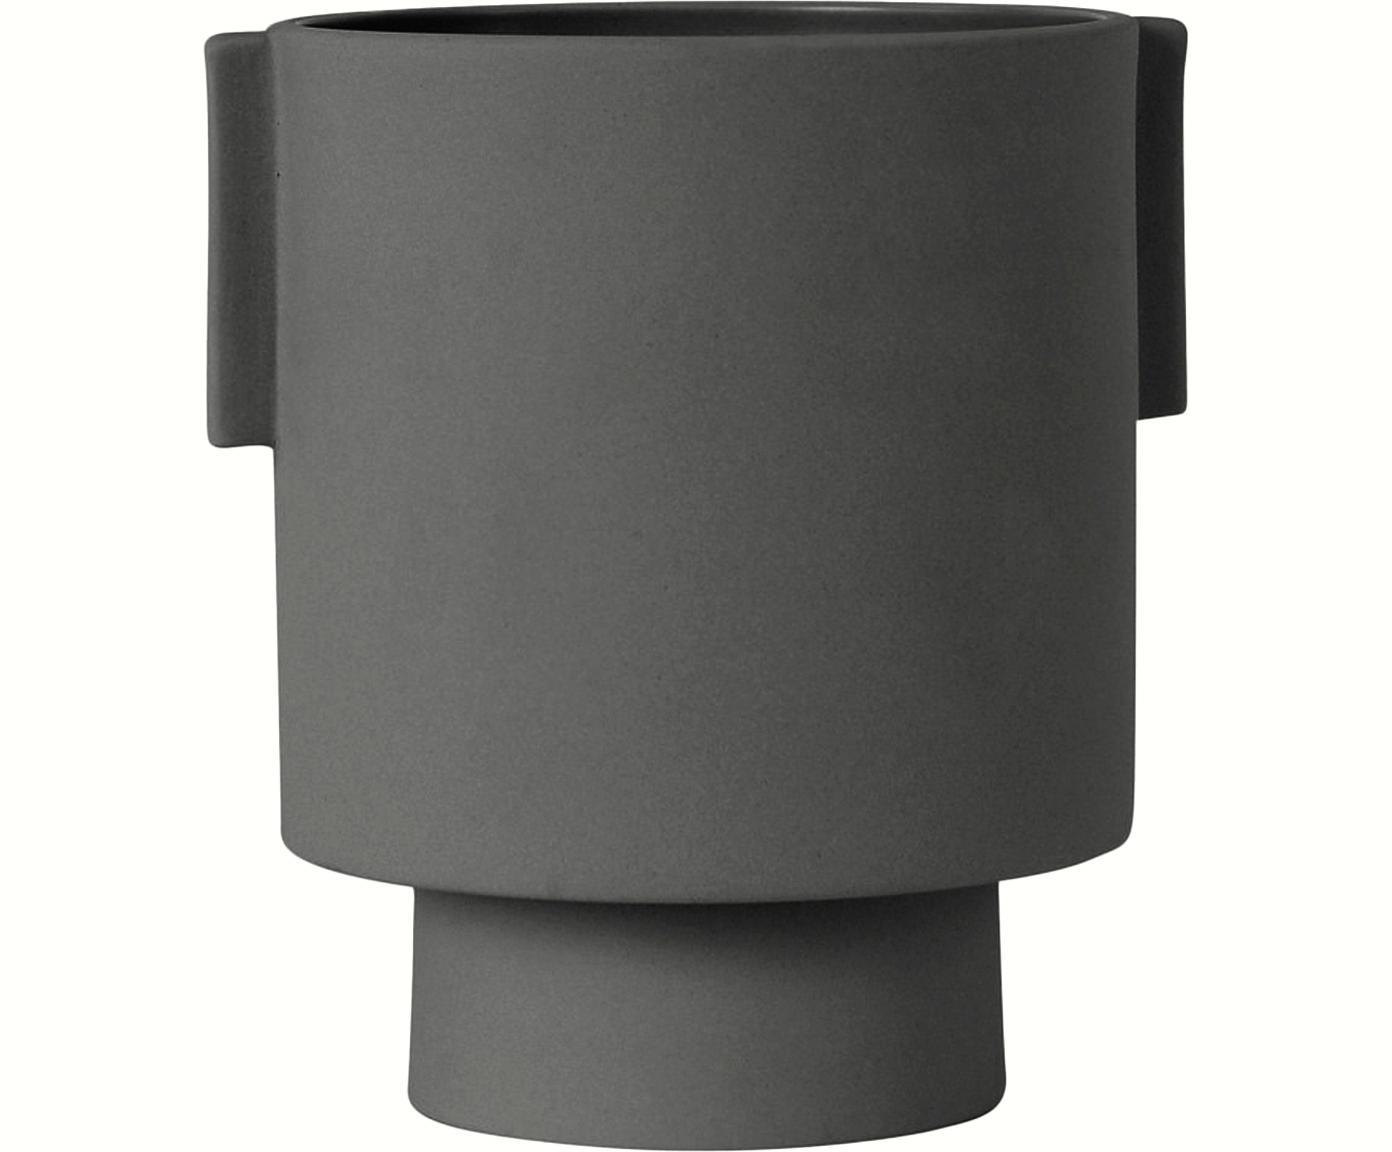 Handgefertigter Übertopf Ika Kana, Keramik, Dunklegrau, Ø 15 x H 16 cm